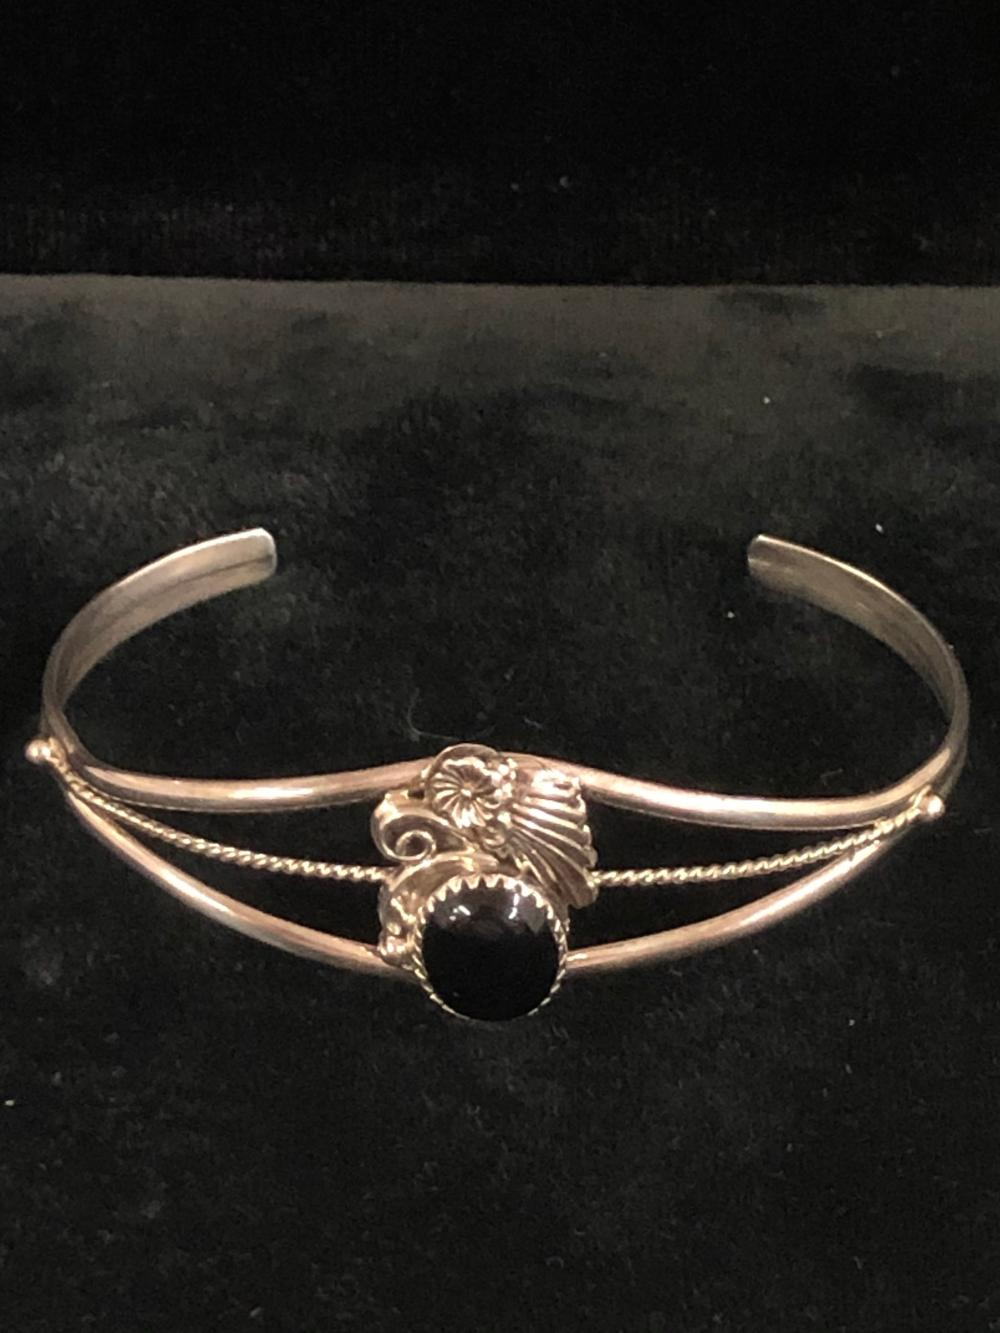 Black onyx sterling silver cuff bracelet